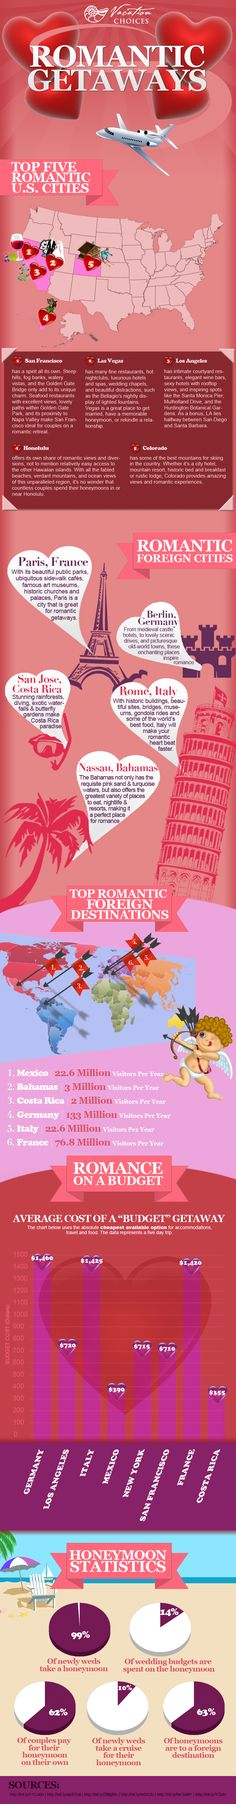 Top Romantic get-aways via Vacation Choices.